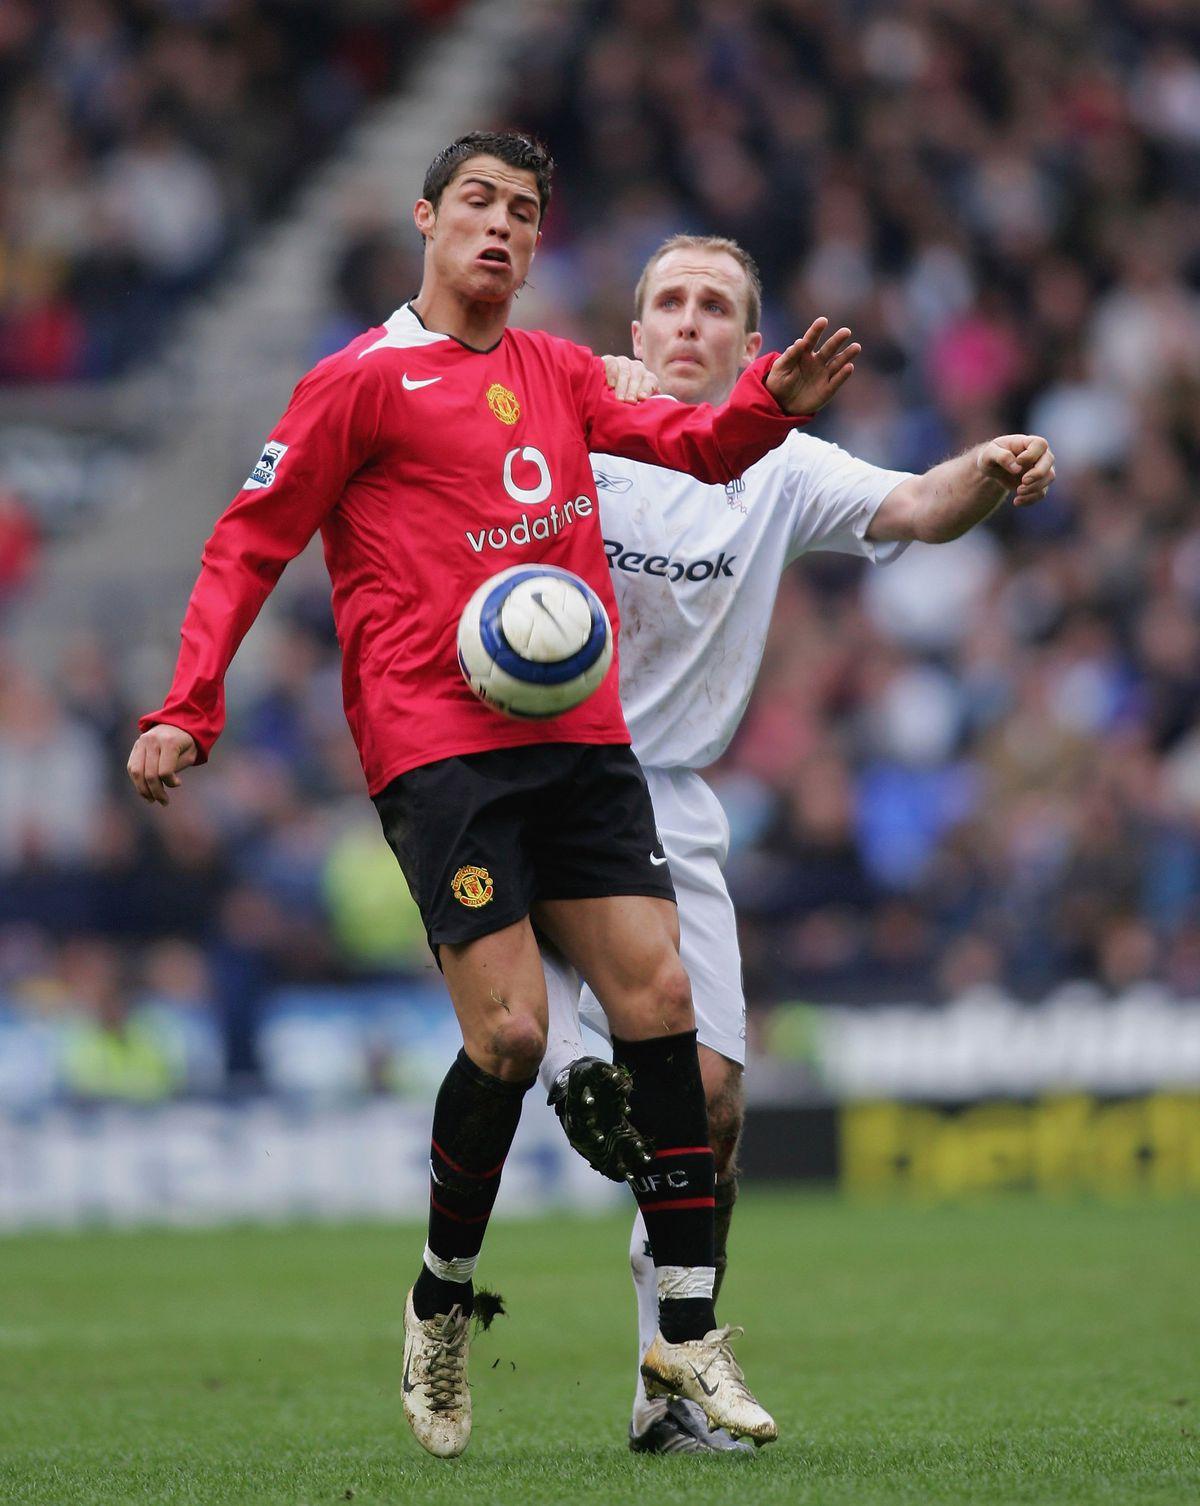 Bolton Wanderers v Manchester United